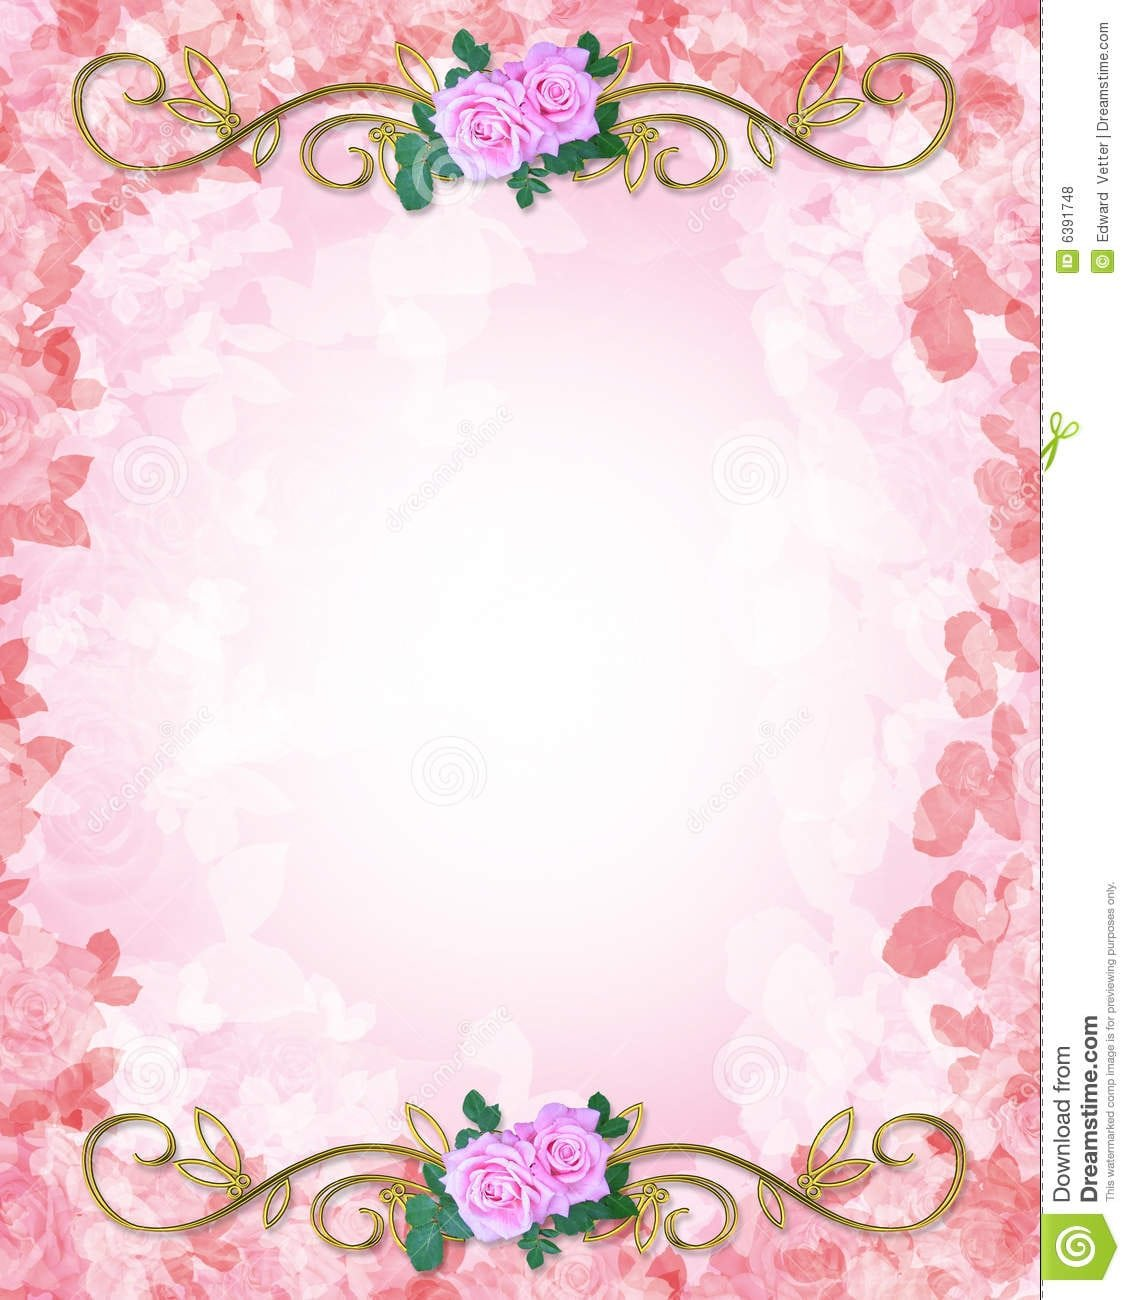 Wedding Invitation Card Templates Photoshop Wedding Inspiring – Wedding Invitation Cards Templates Free Download